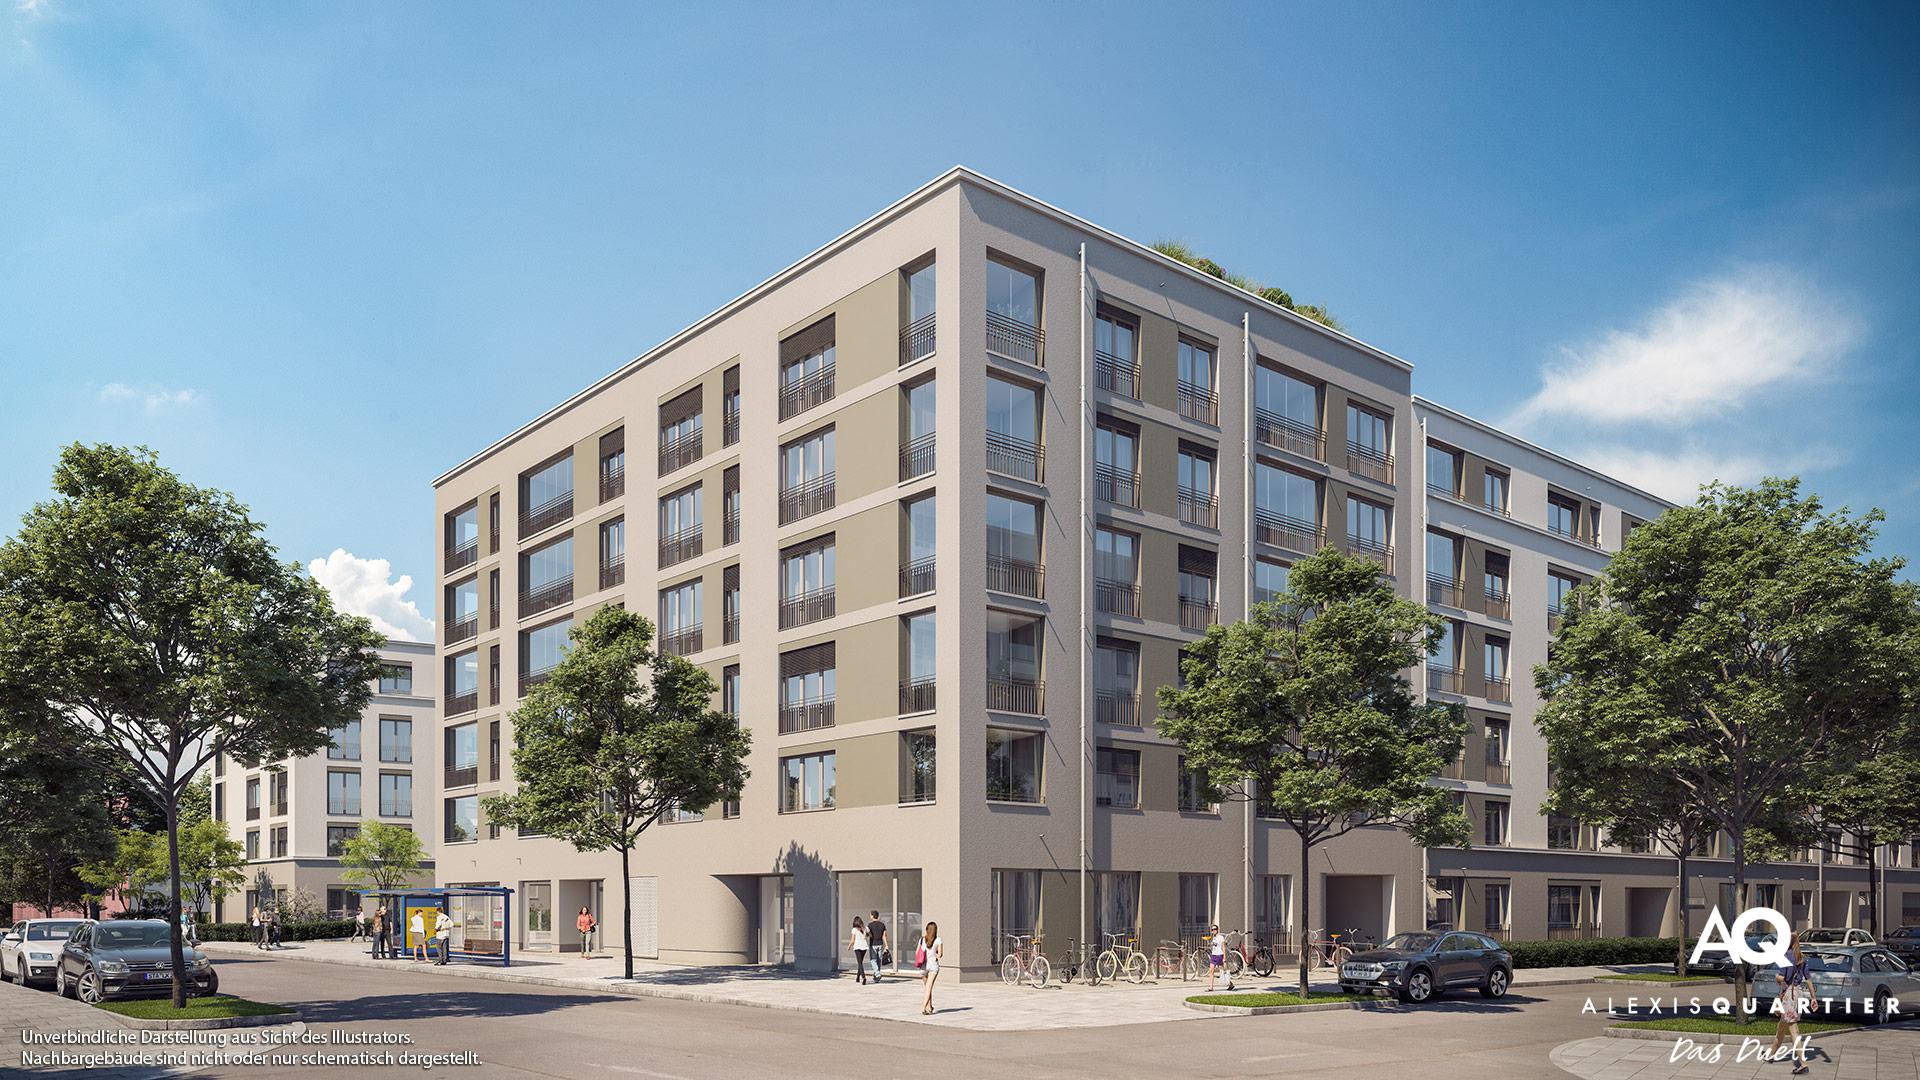 Immobilie Alexisquartier - Das Duett - Illustration 3